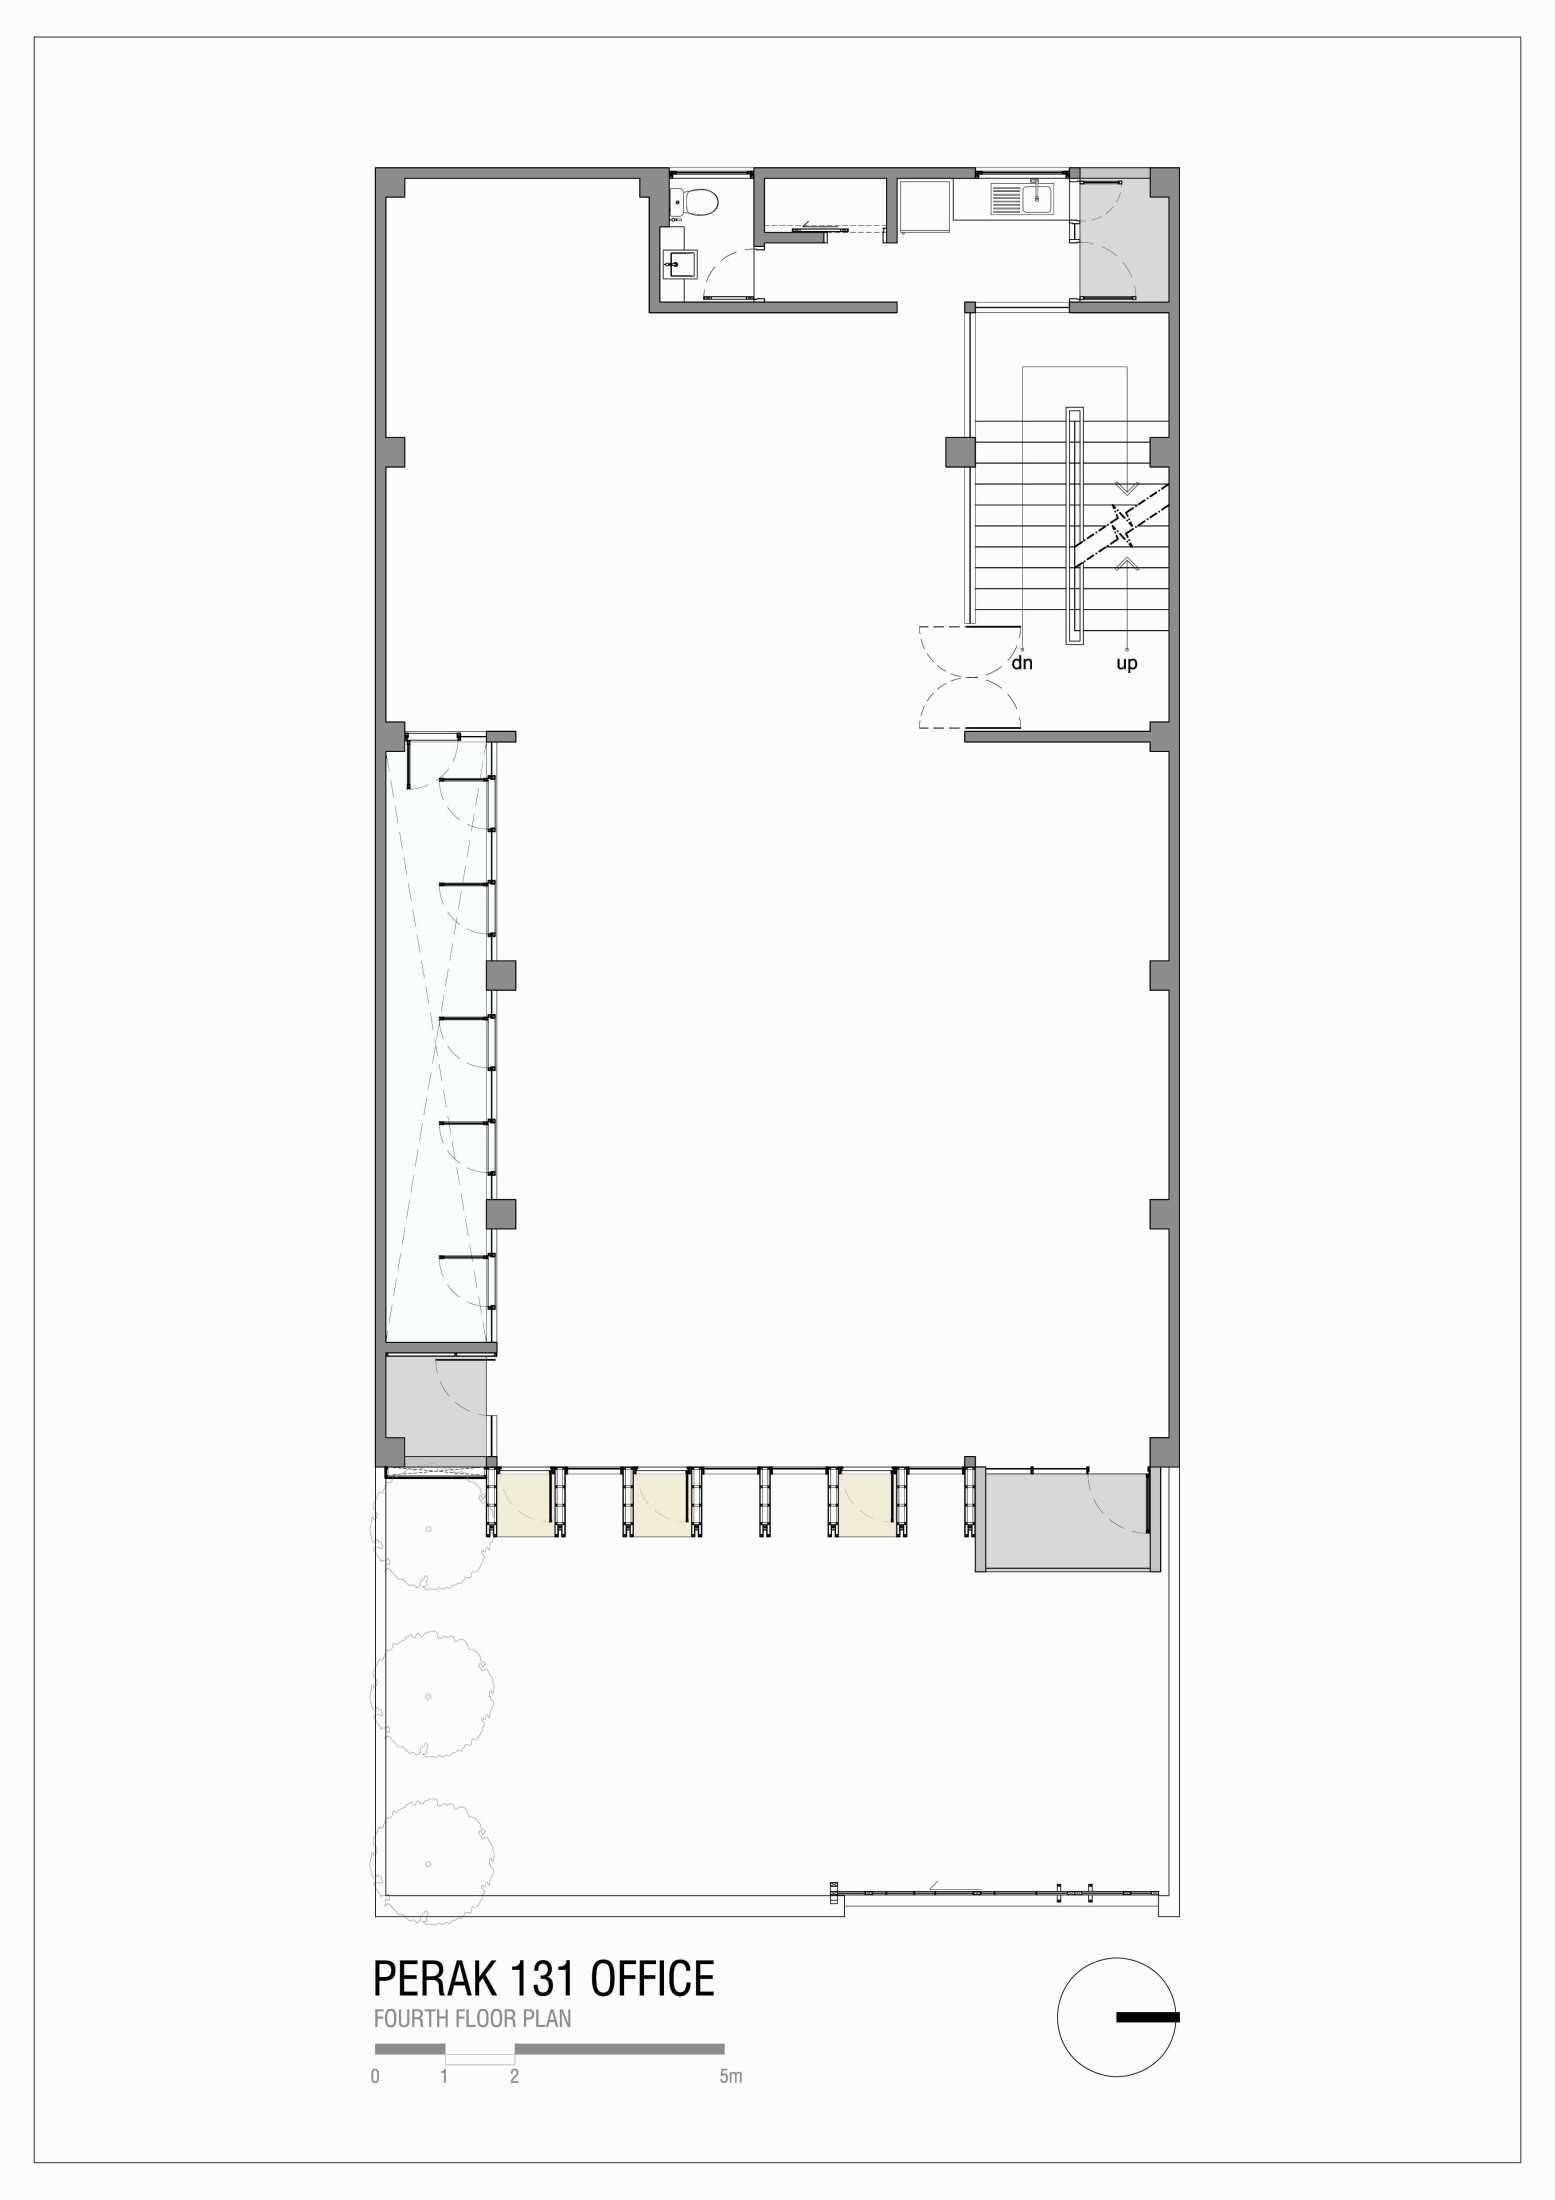 Simple Projects Architecture Pb131 Office Jl.perak Barat 131, Surabaya - Indonesia Jl.perak Barat 131, Surabaya - Indonesia Simple-Projects-Architecture-Pb131-Office  59150